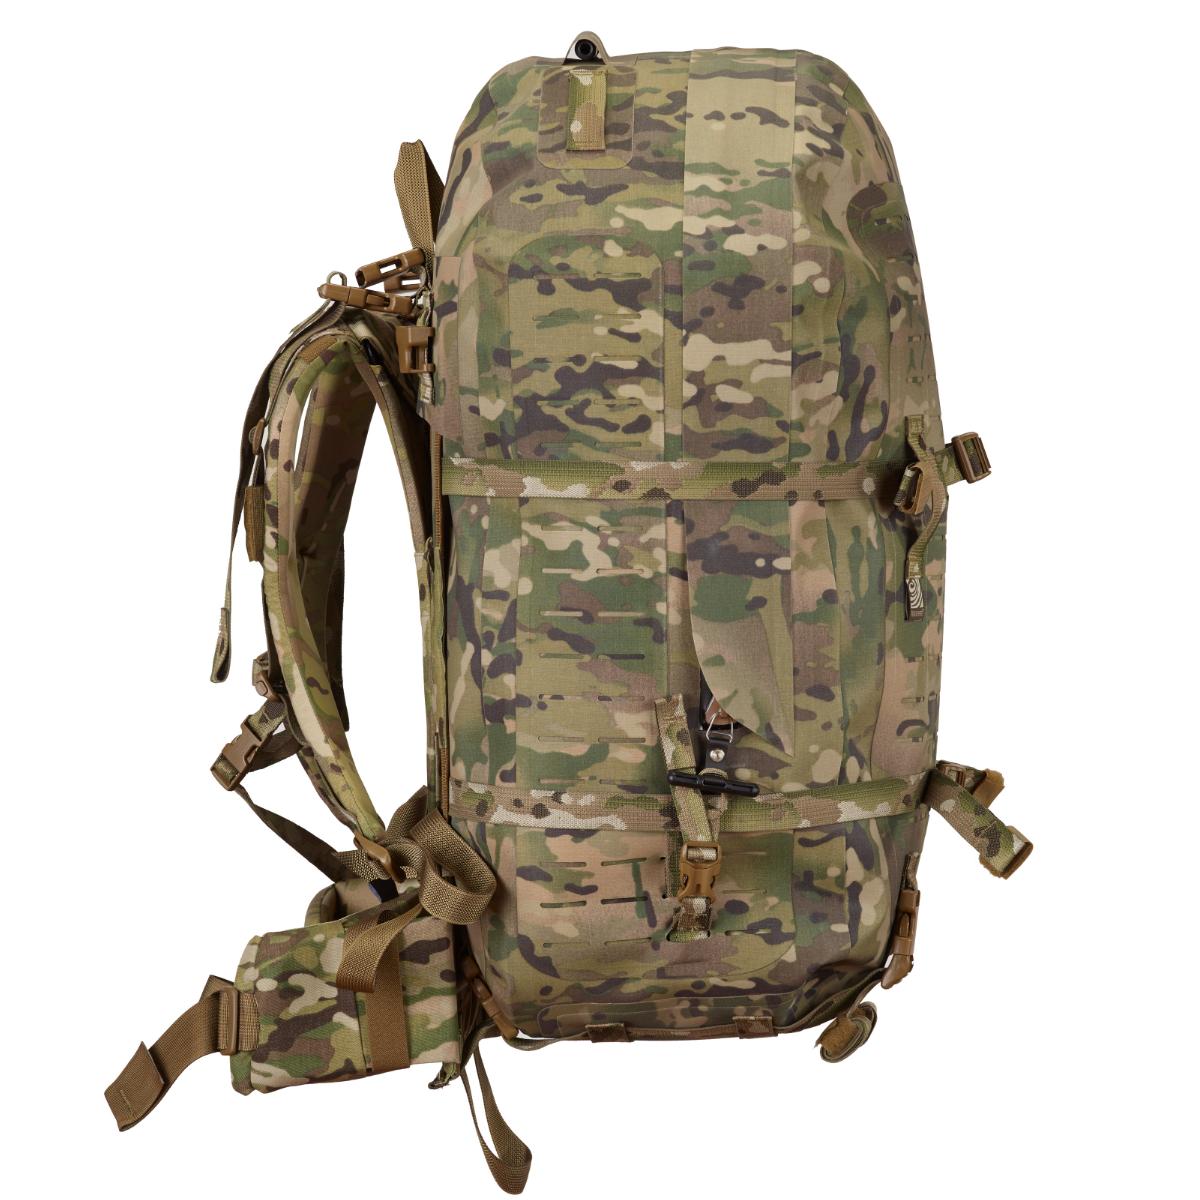 OTB 75™ Backpack, Multicam - Watershed Drybags